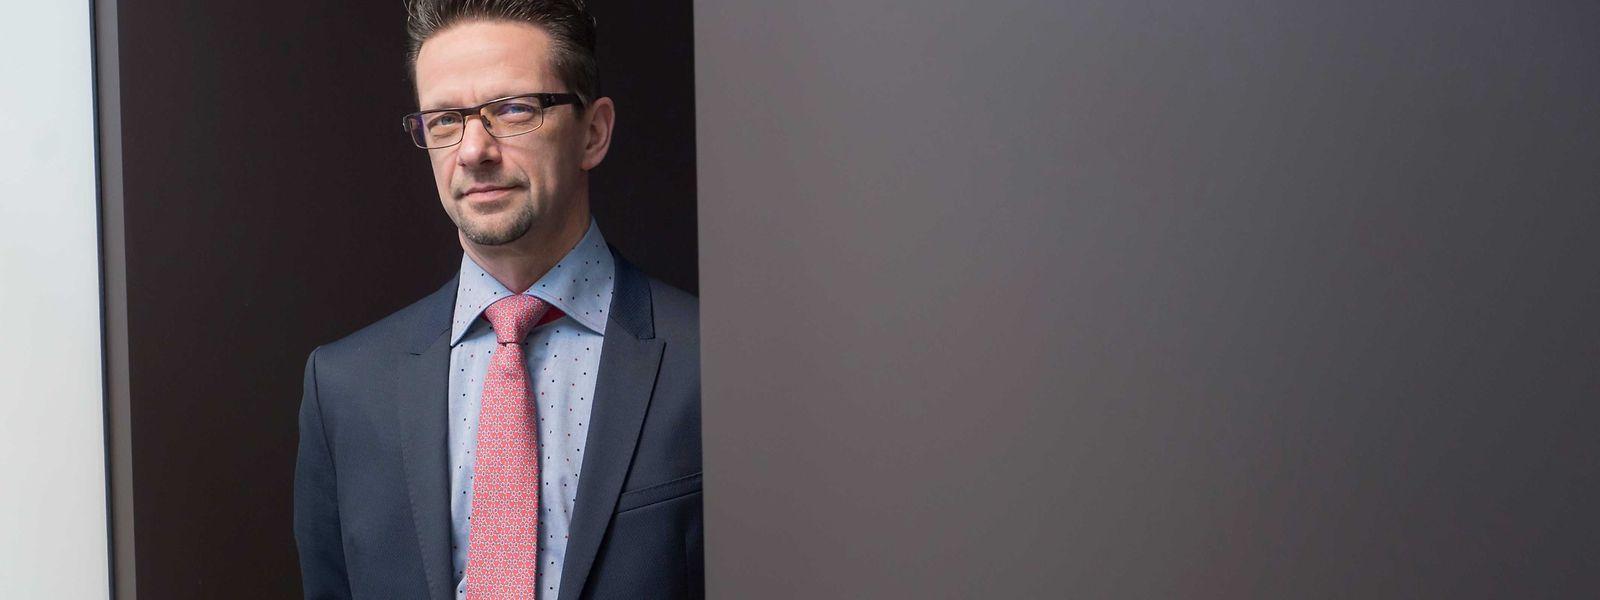 Johnny Brebels est Directeur Company Relations and Support au sein de Luxinnovation.